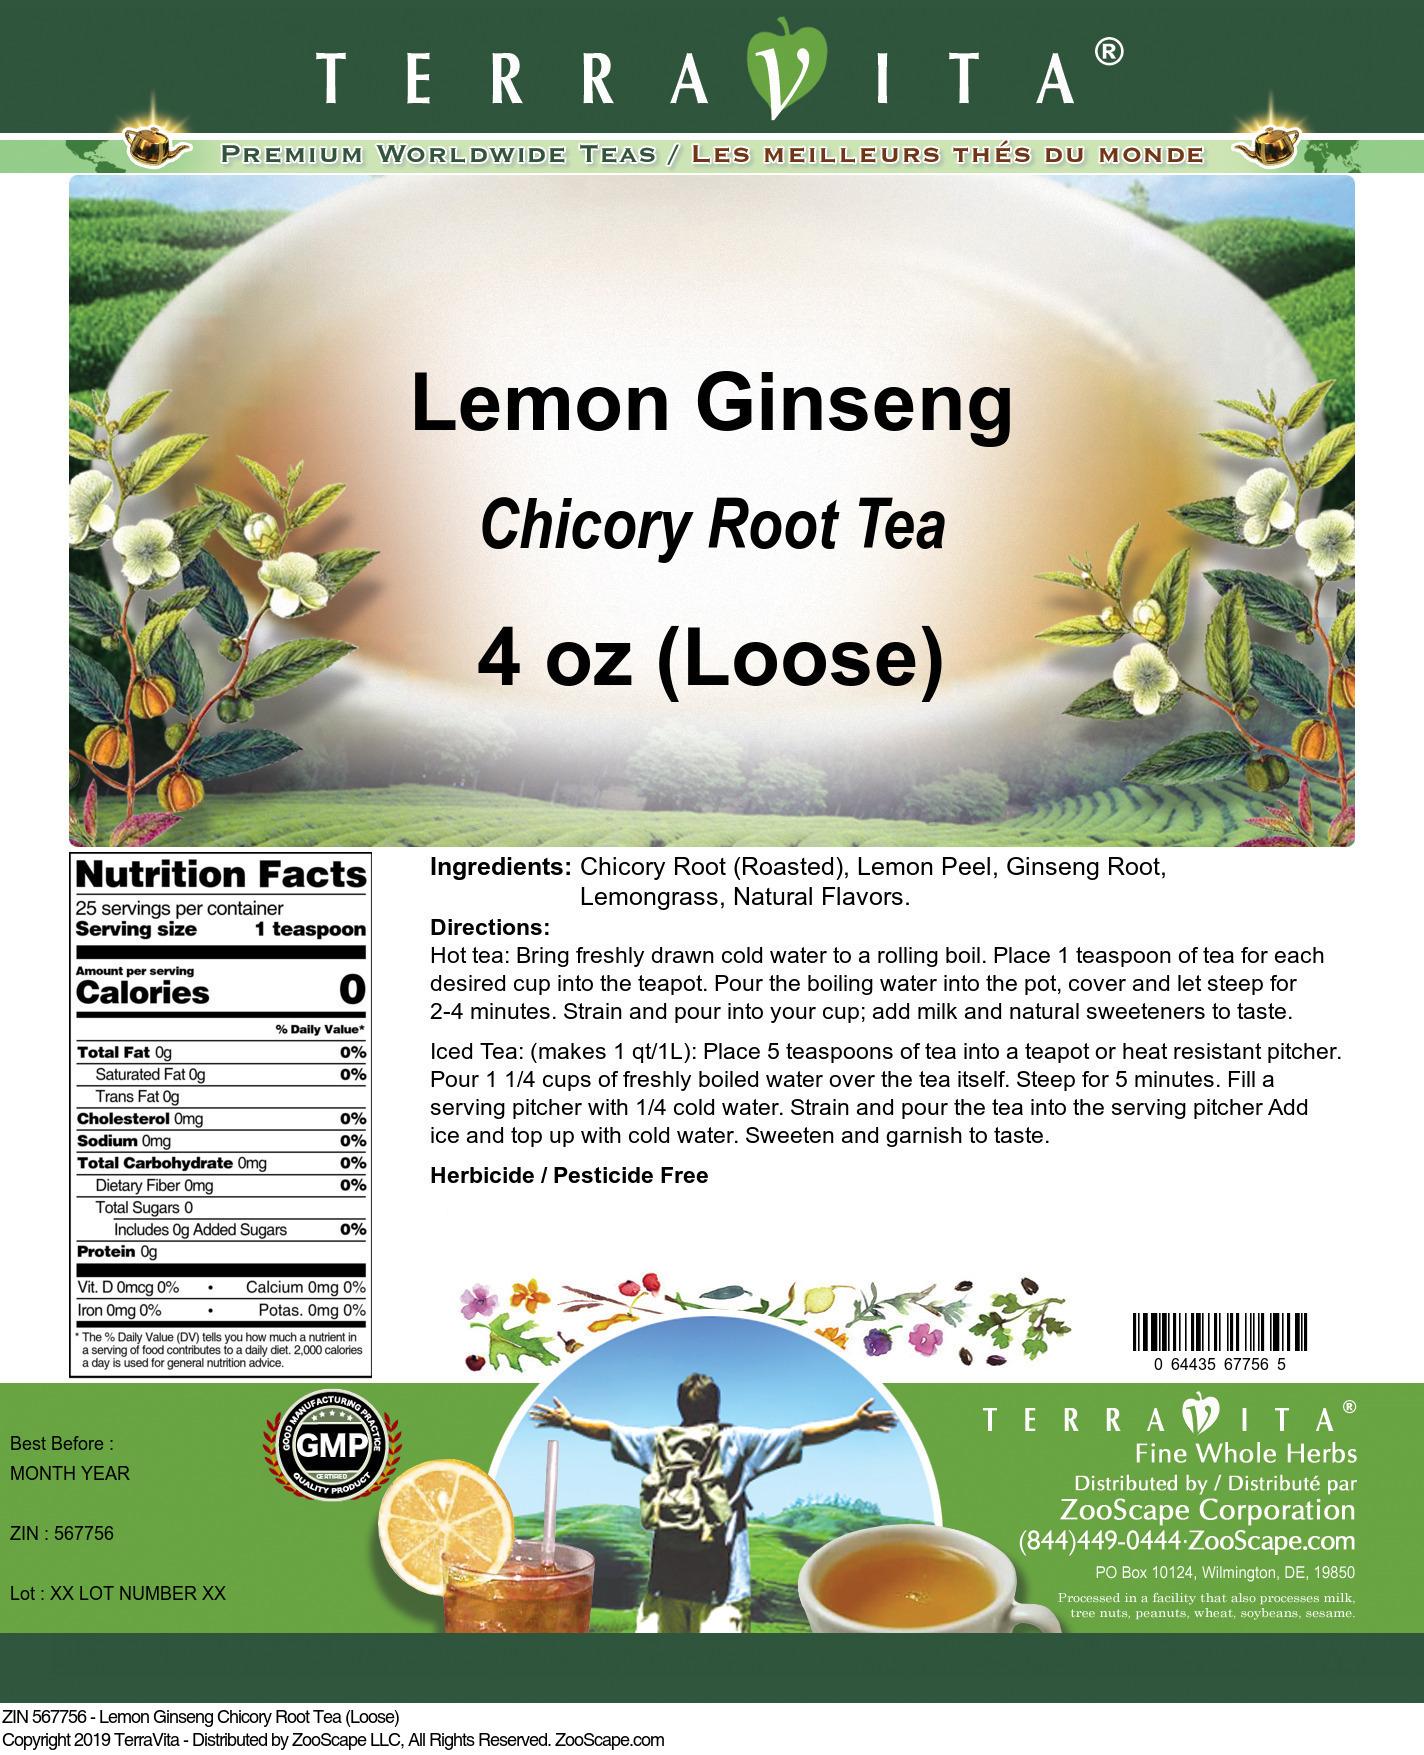 Lemon Ginseng Chicory Root Tea (Loose)